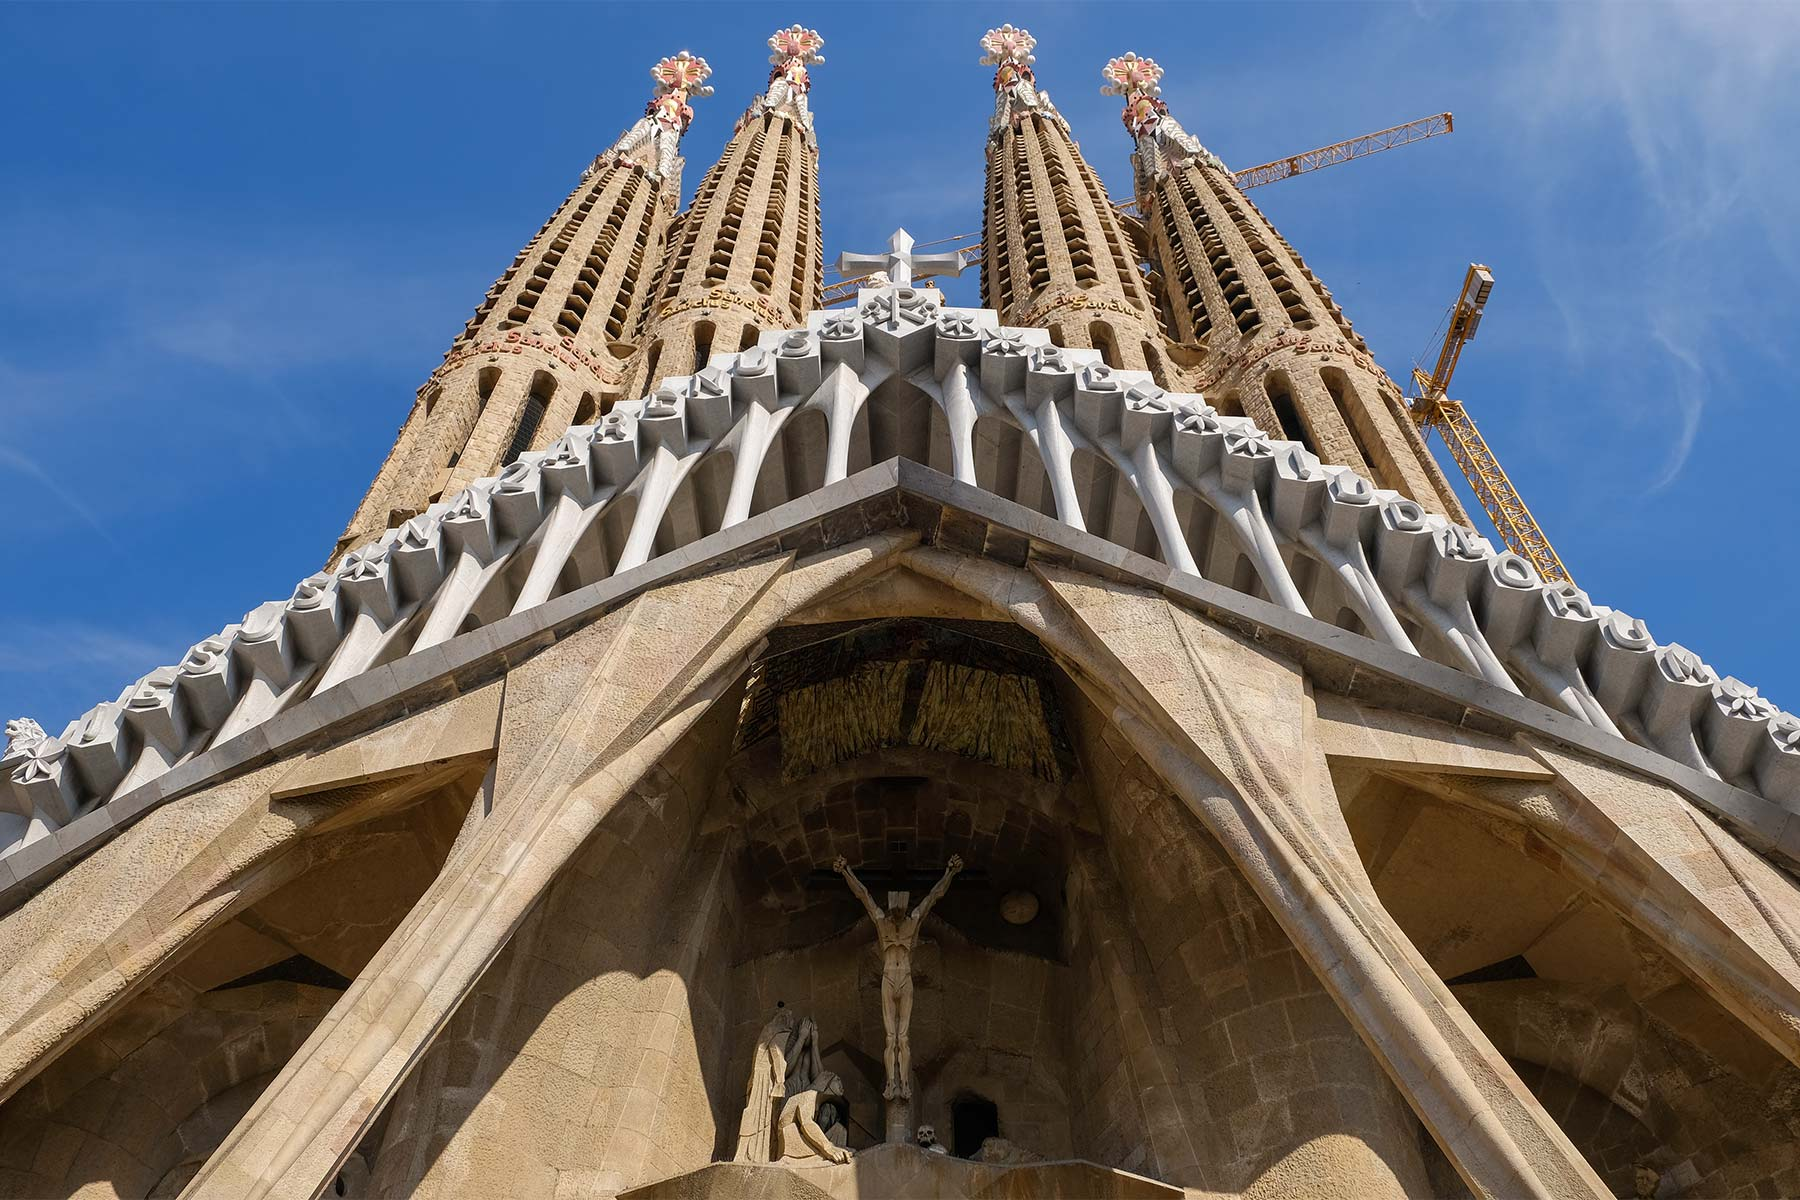 Passionsfassade der Sagrada Familia von Antoni Gaudi in Barcelona